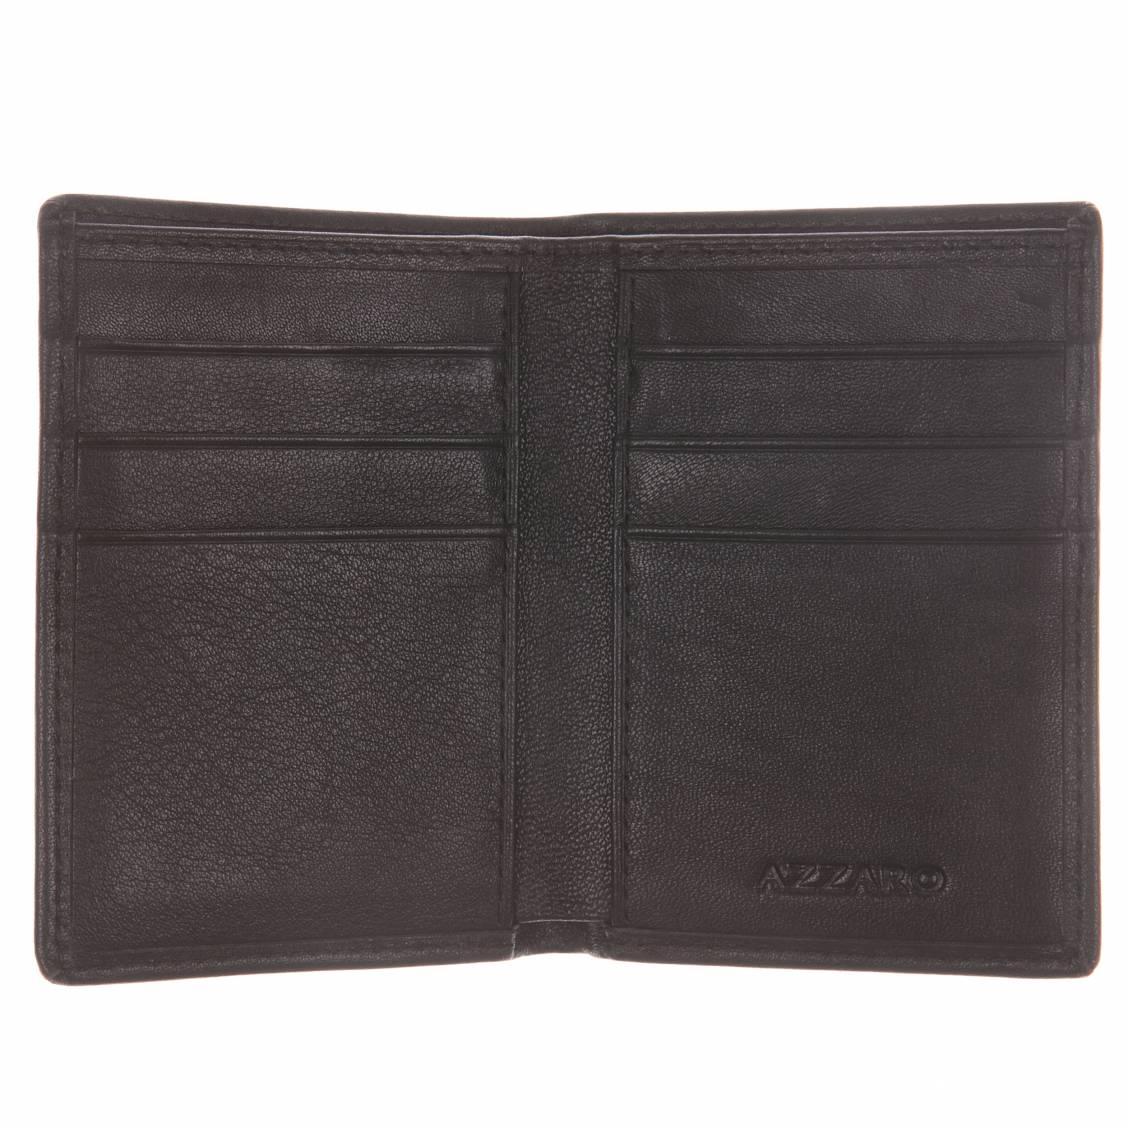 Porte carte cuir homme luxe - Porte carte cuir homme luxe ...